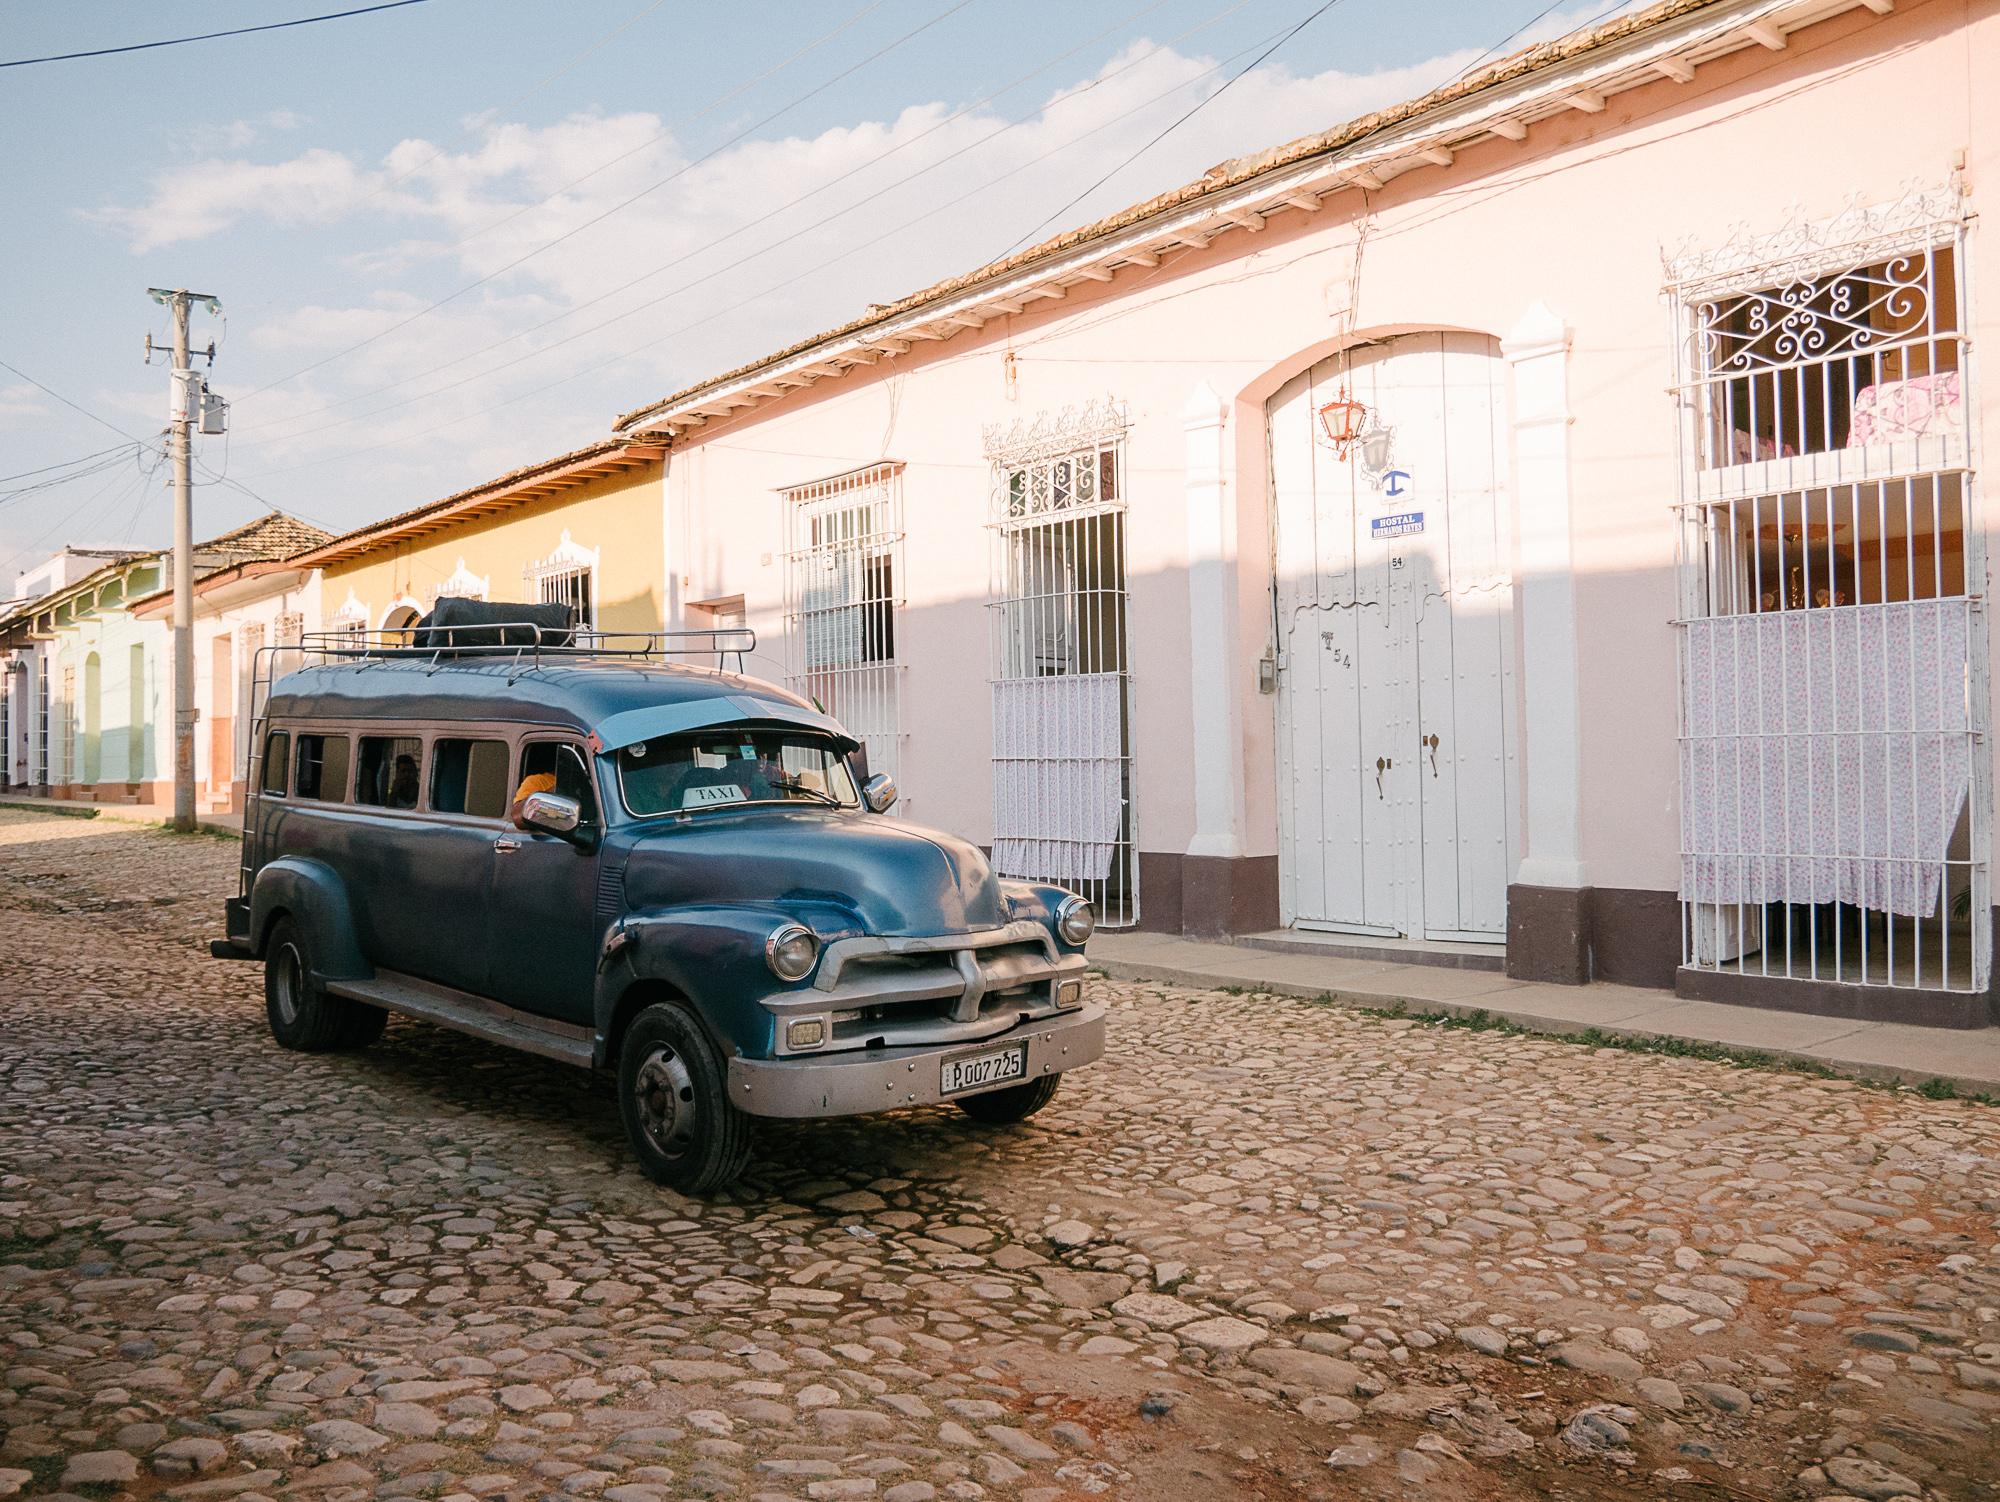 travel-explore-cuba-trinidad-cuba-old-american-car-taxi.jpg